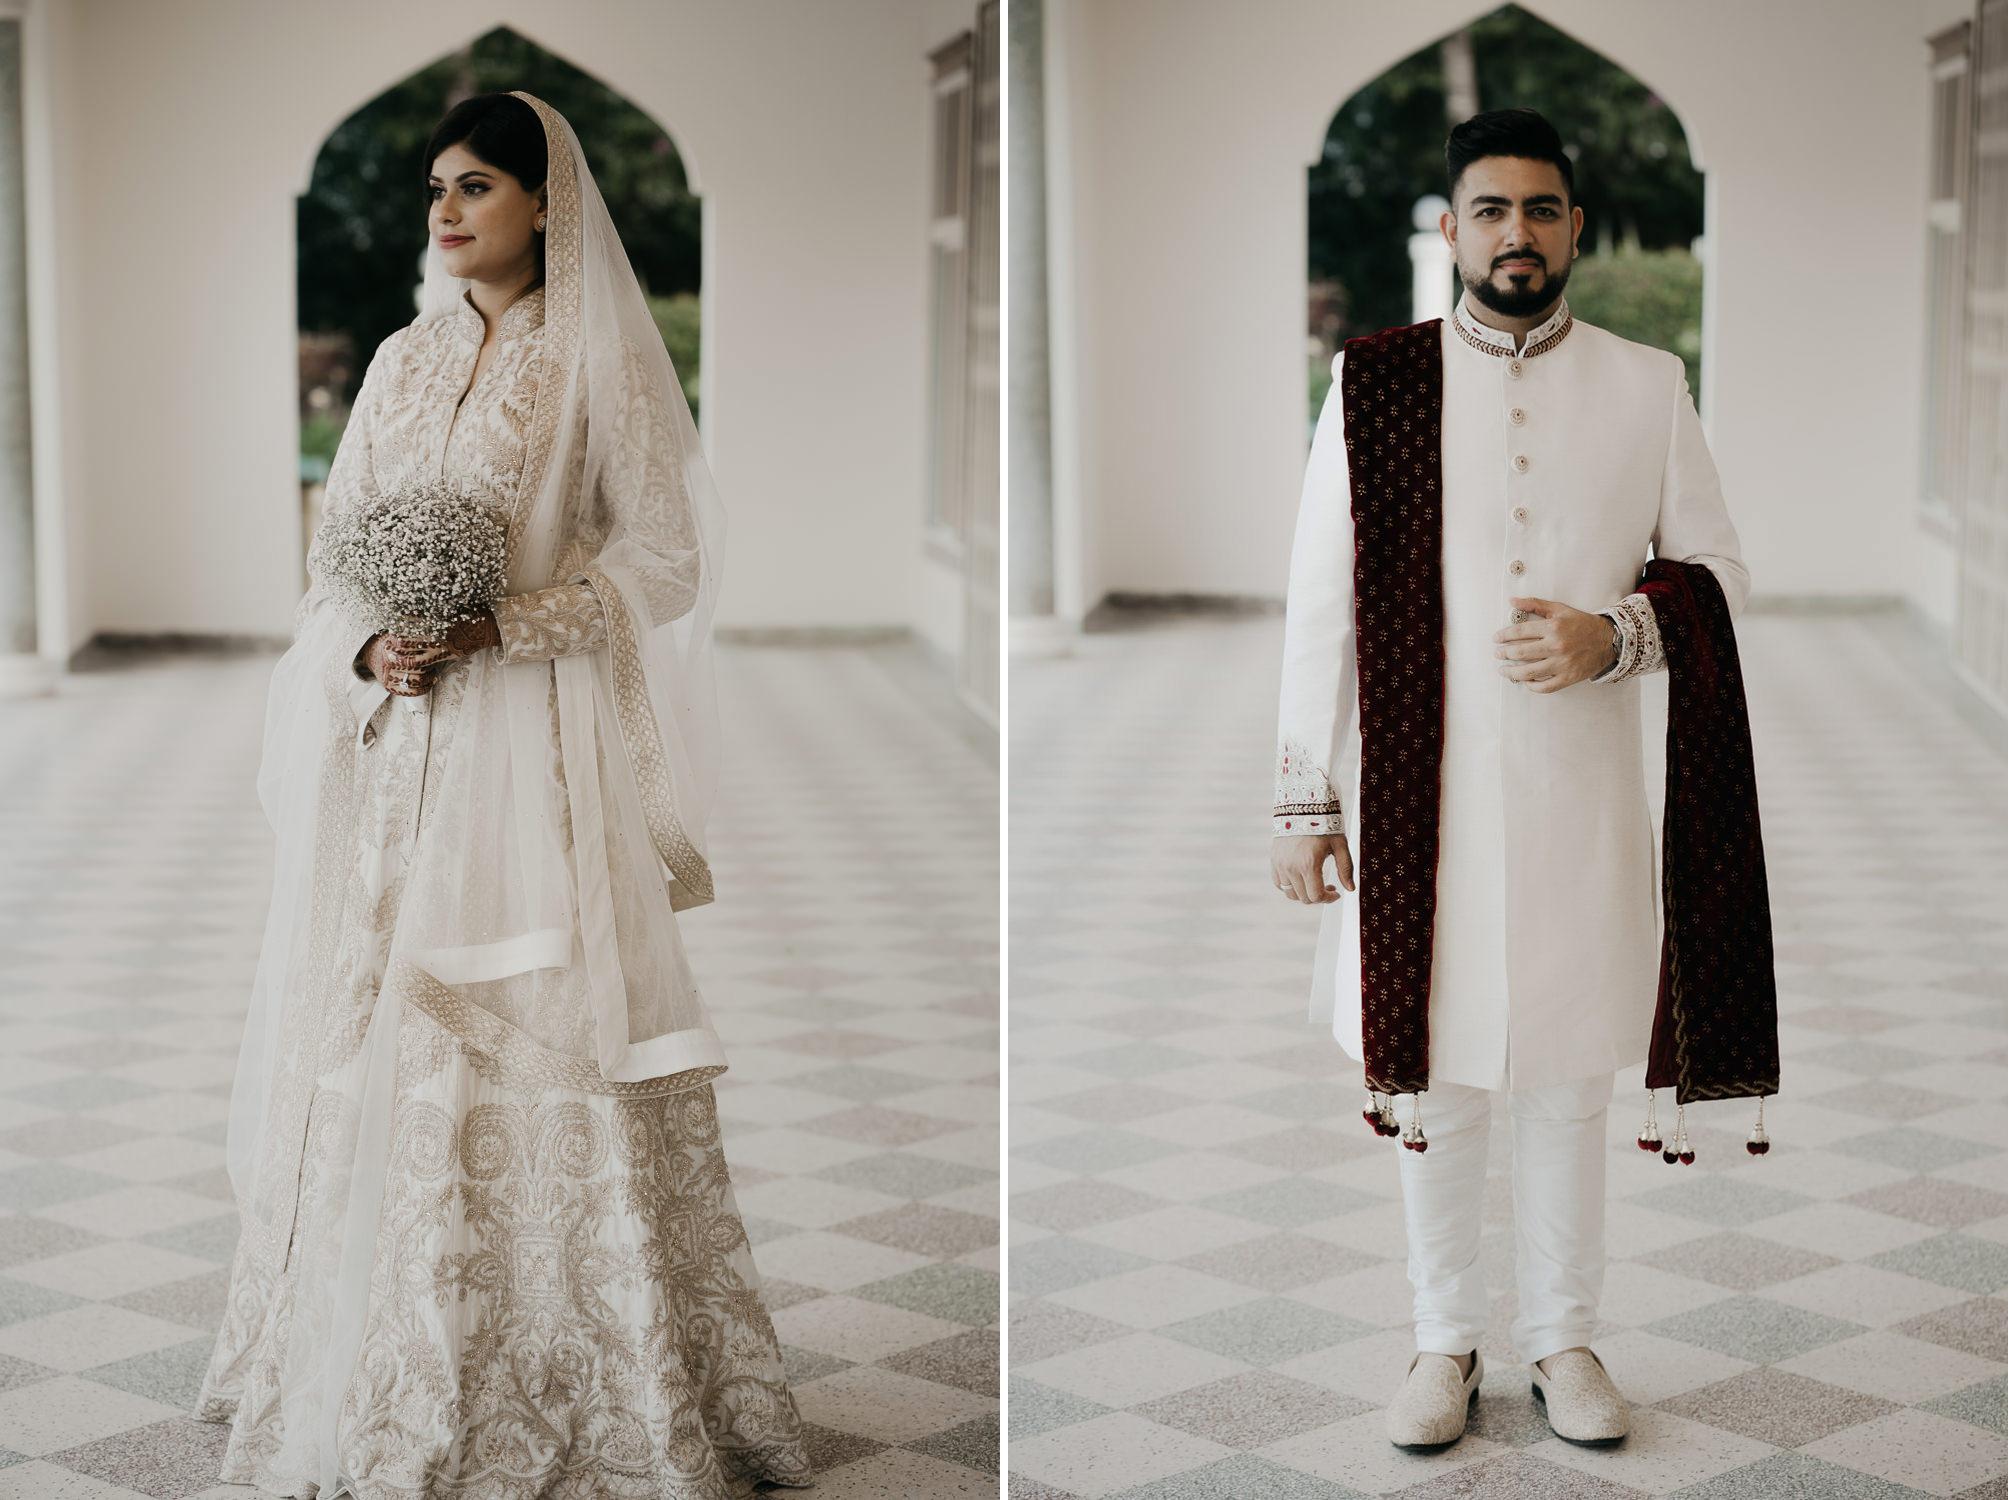 indian wedding bridal portraits tanzania photographer mark hadden